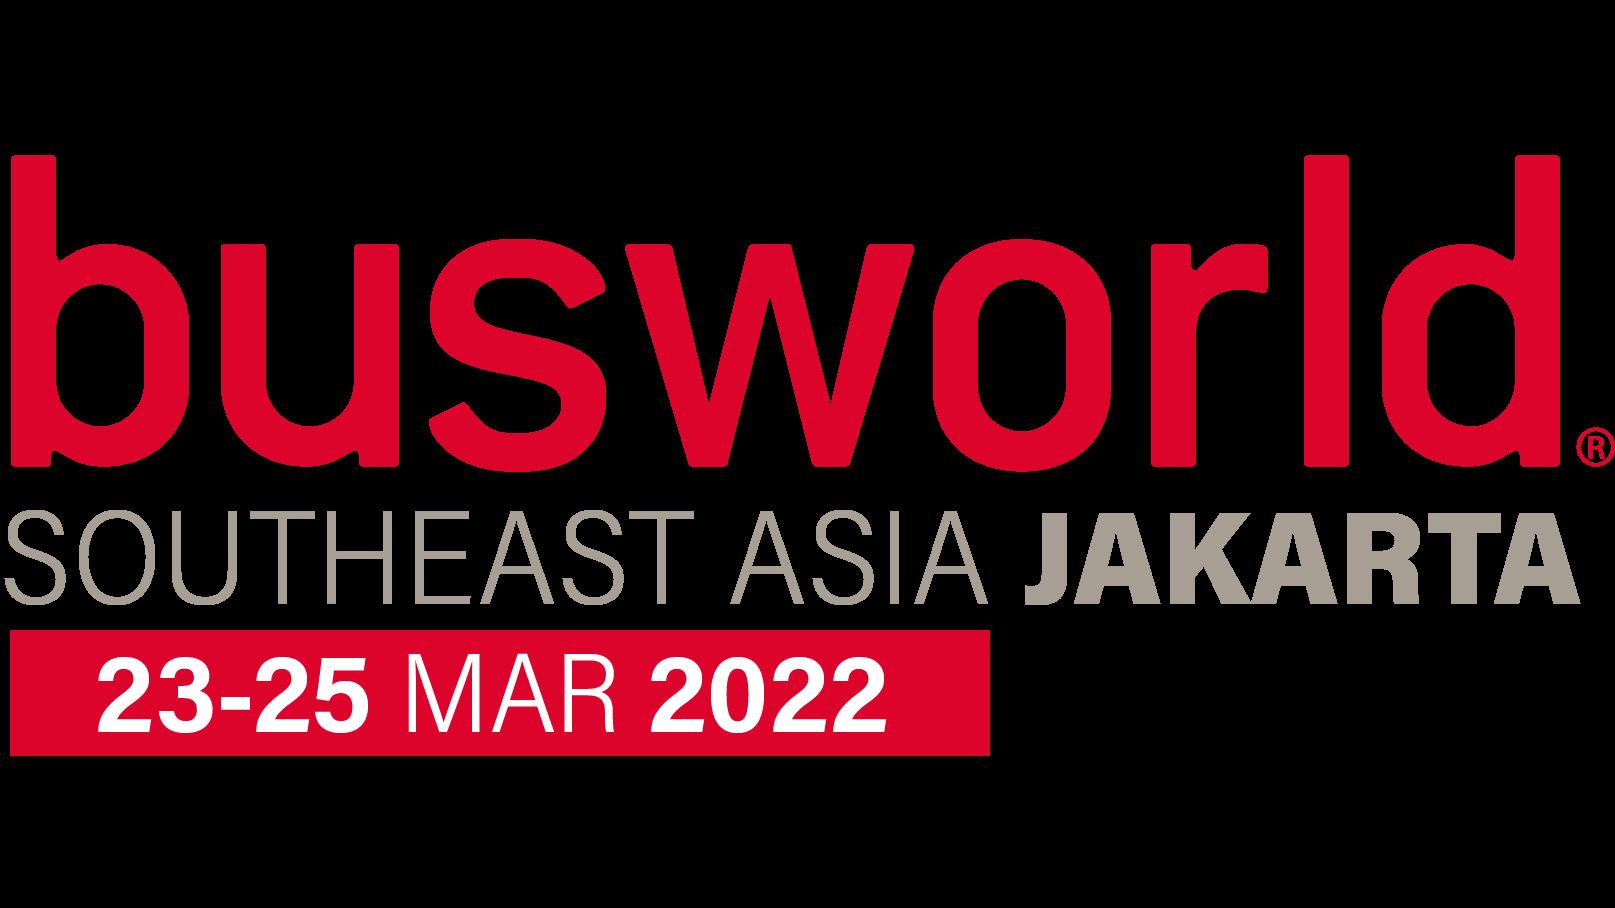 Busworld Southeast Asia 2022